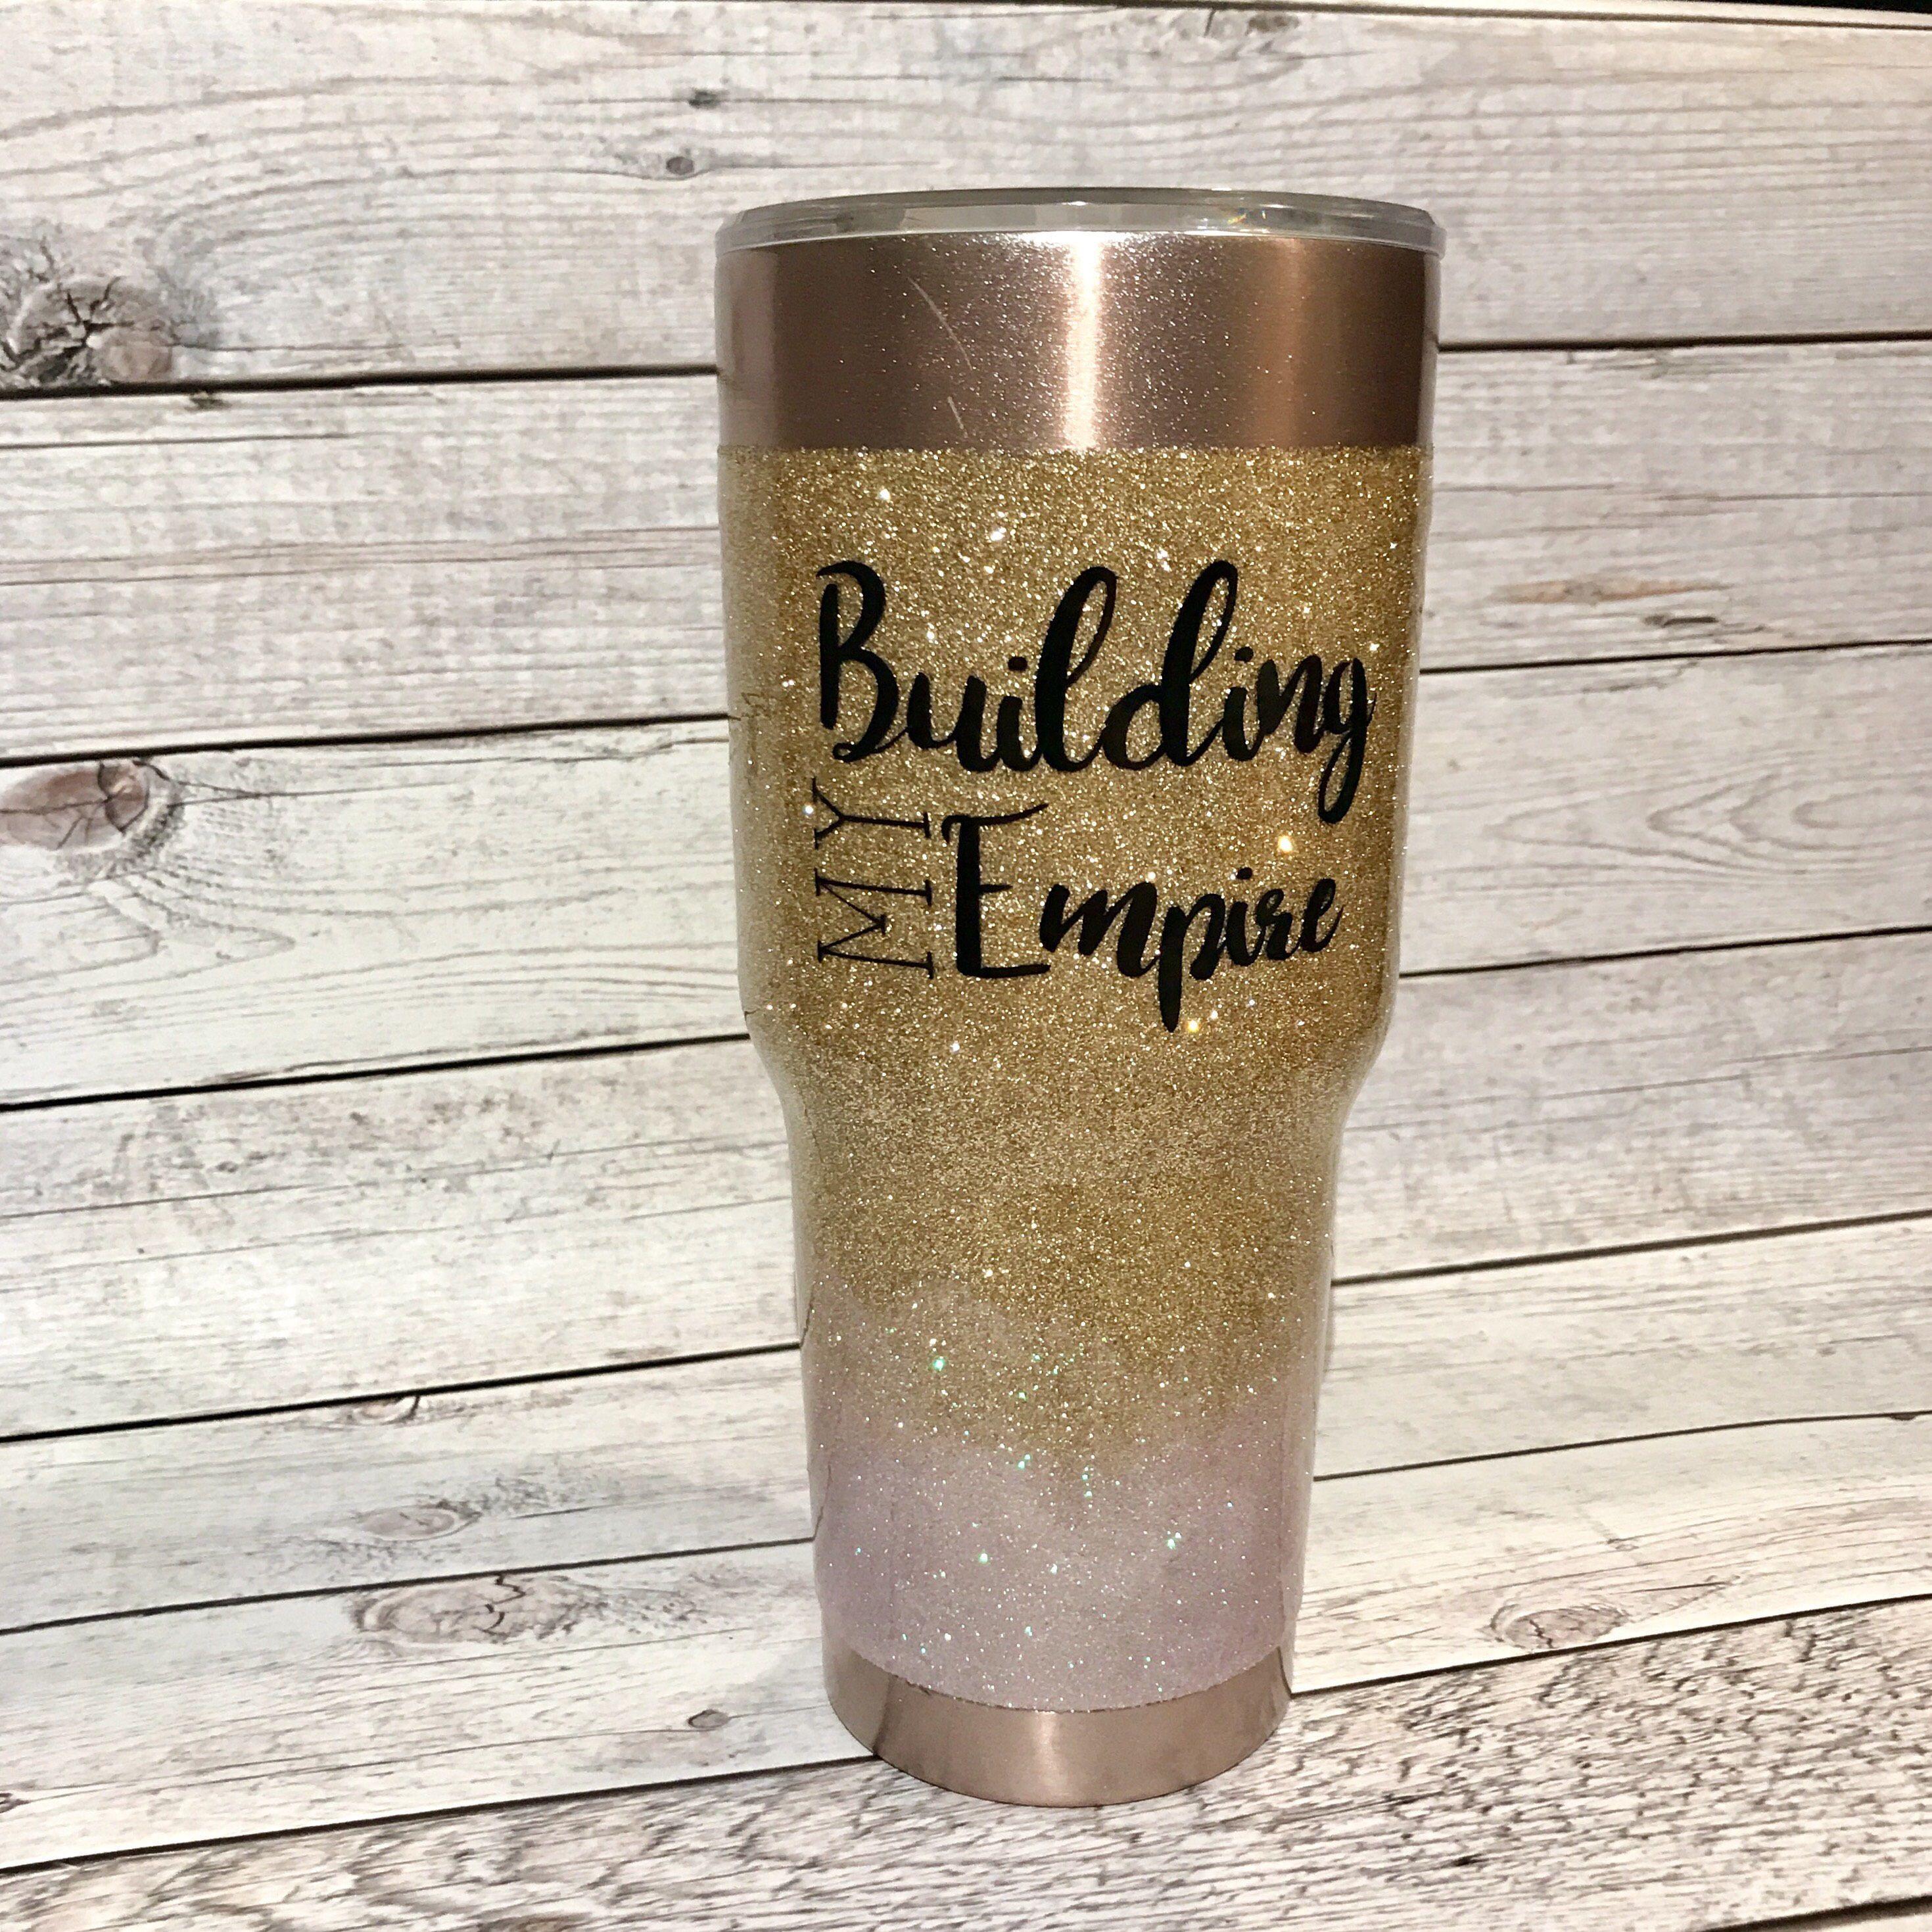 00685f3ec38 Pin by Danielle Donati on DAM Fancy Creations | Glitter cups ...